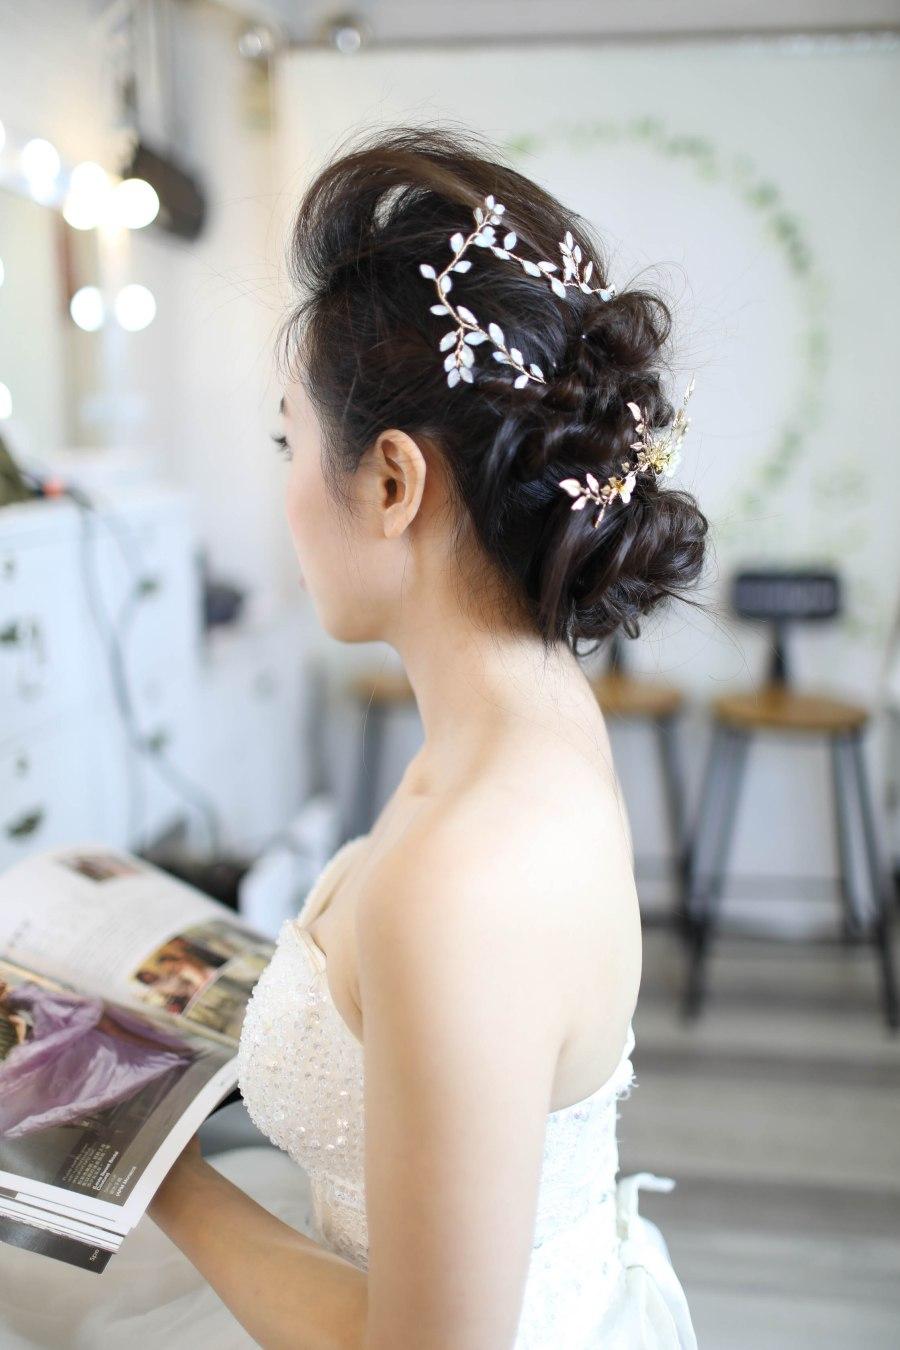 韓式新娘化妝髮型攝影_bridal_wedding_Korea_makeup_hairstyling_Top_MUA_paulstylist_photography_hk_stephanie-25